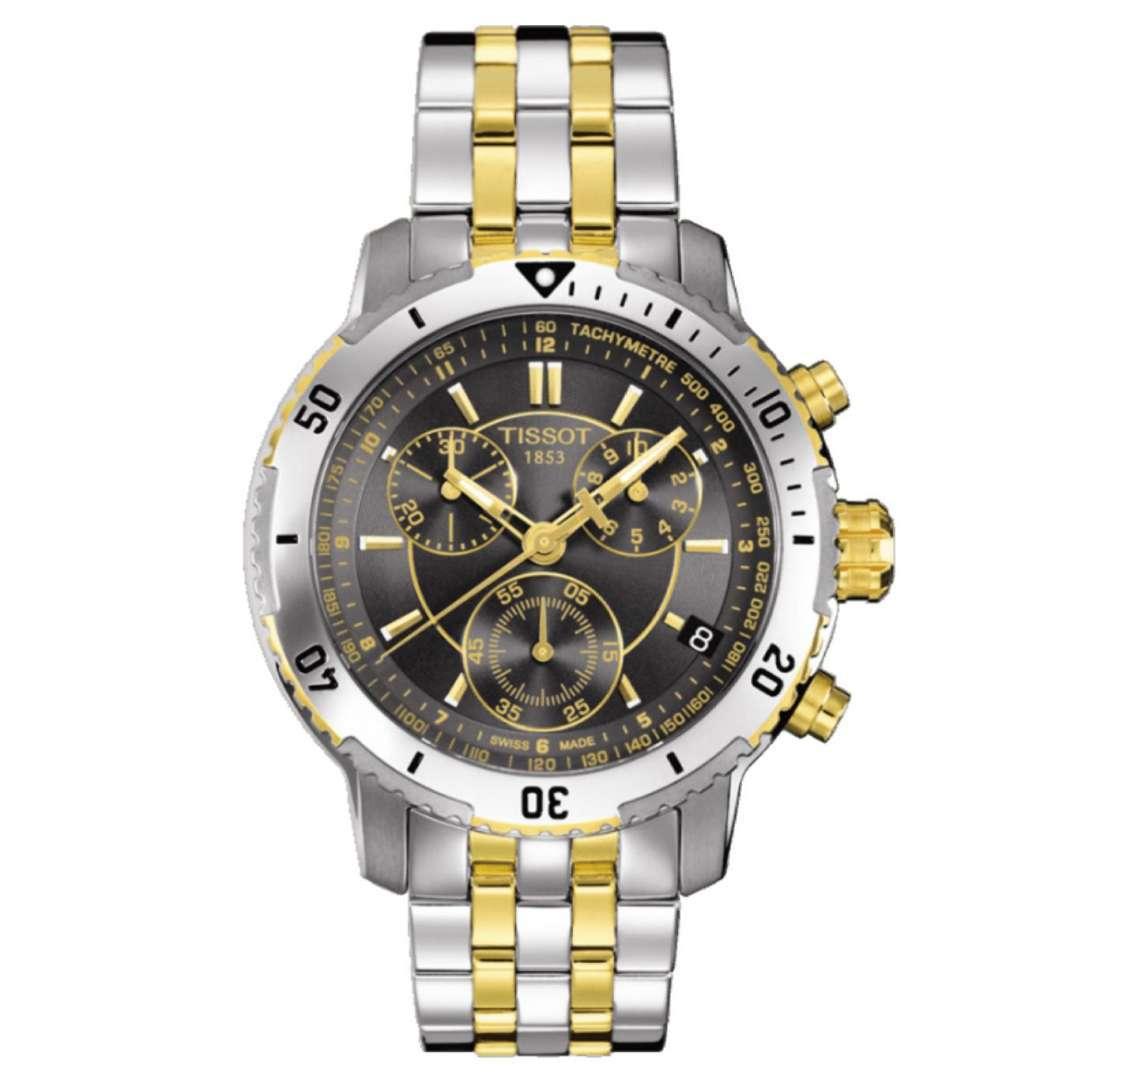 שעון יד אנלוגי tissot t067.417.22.051.00 טיסו